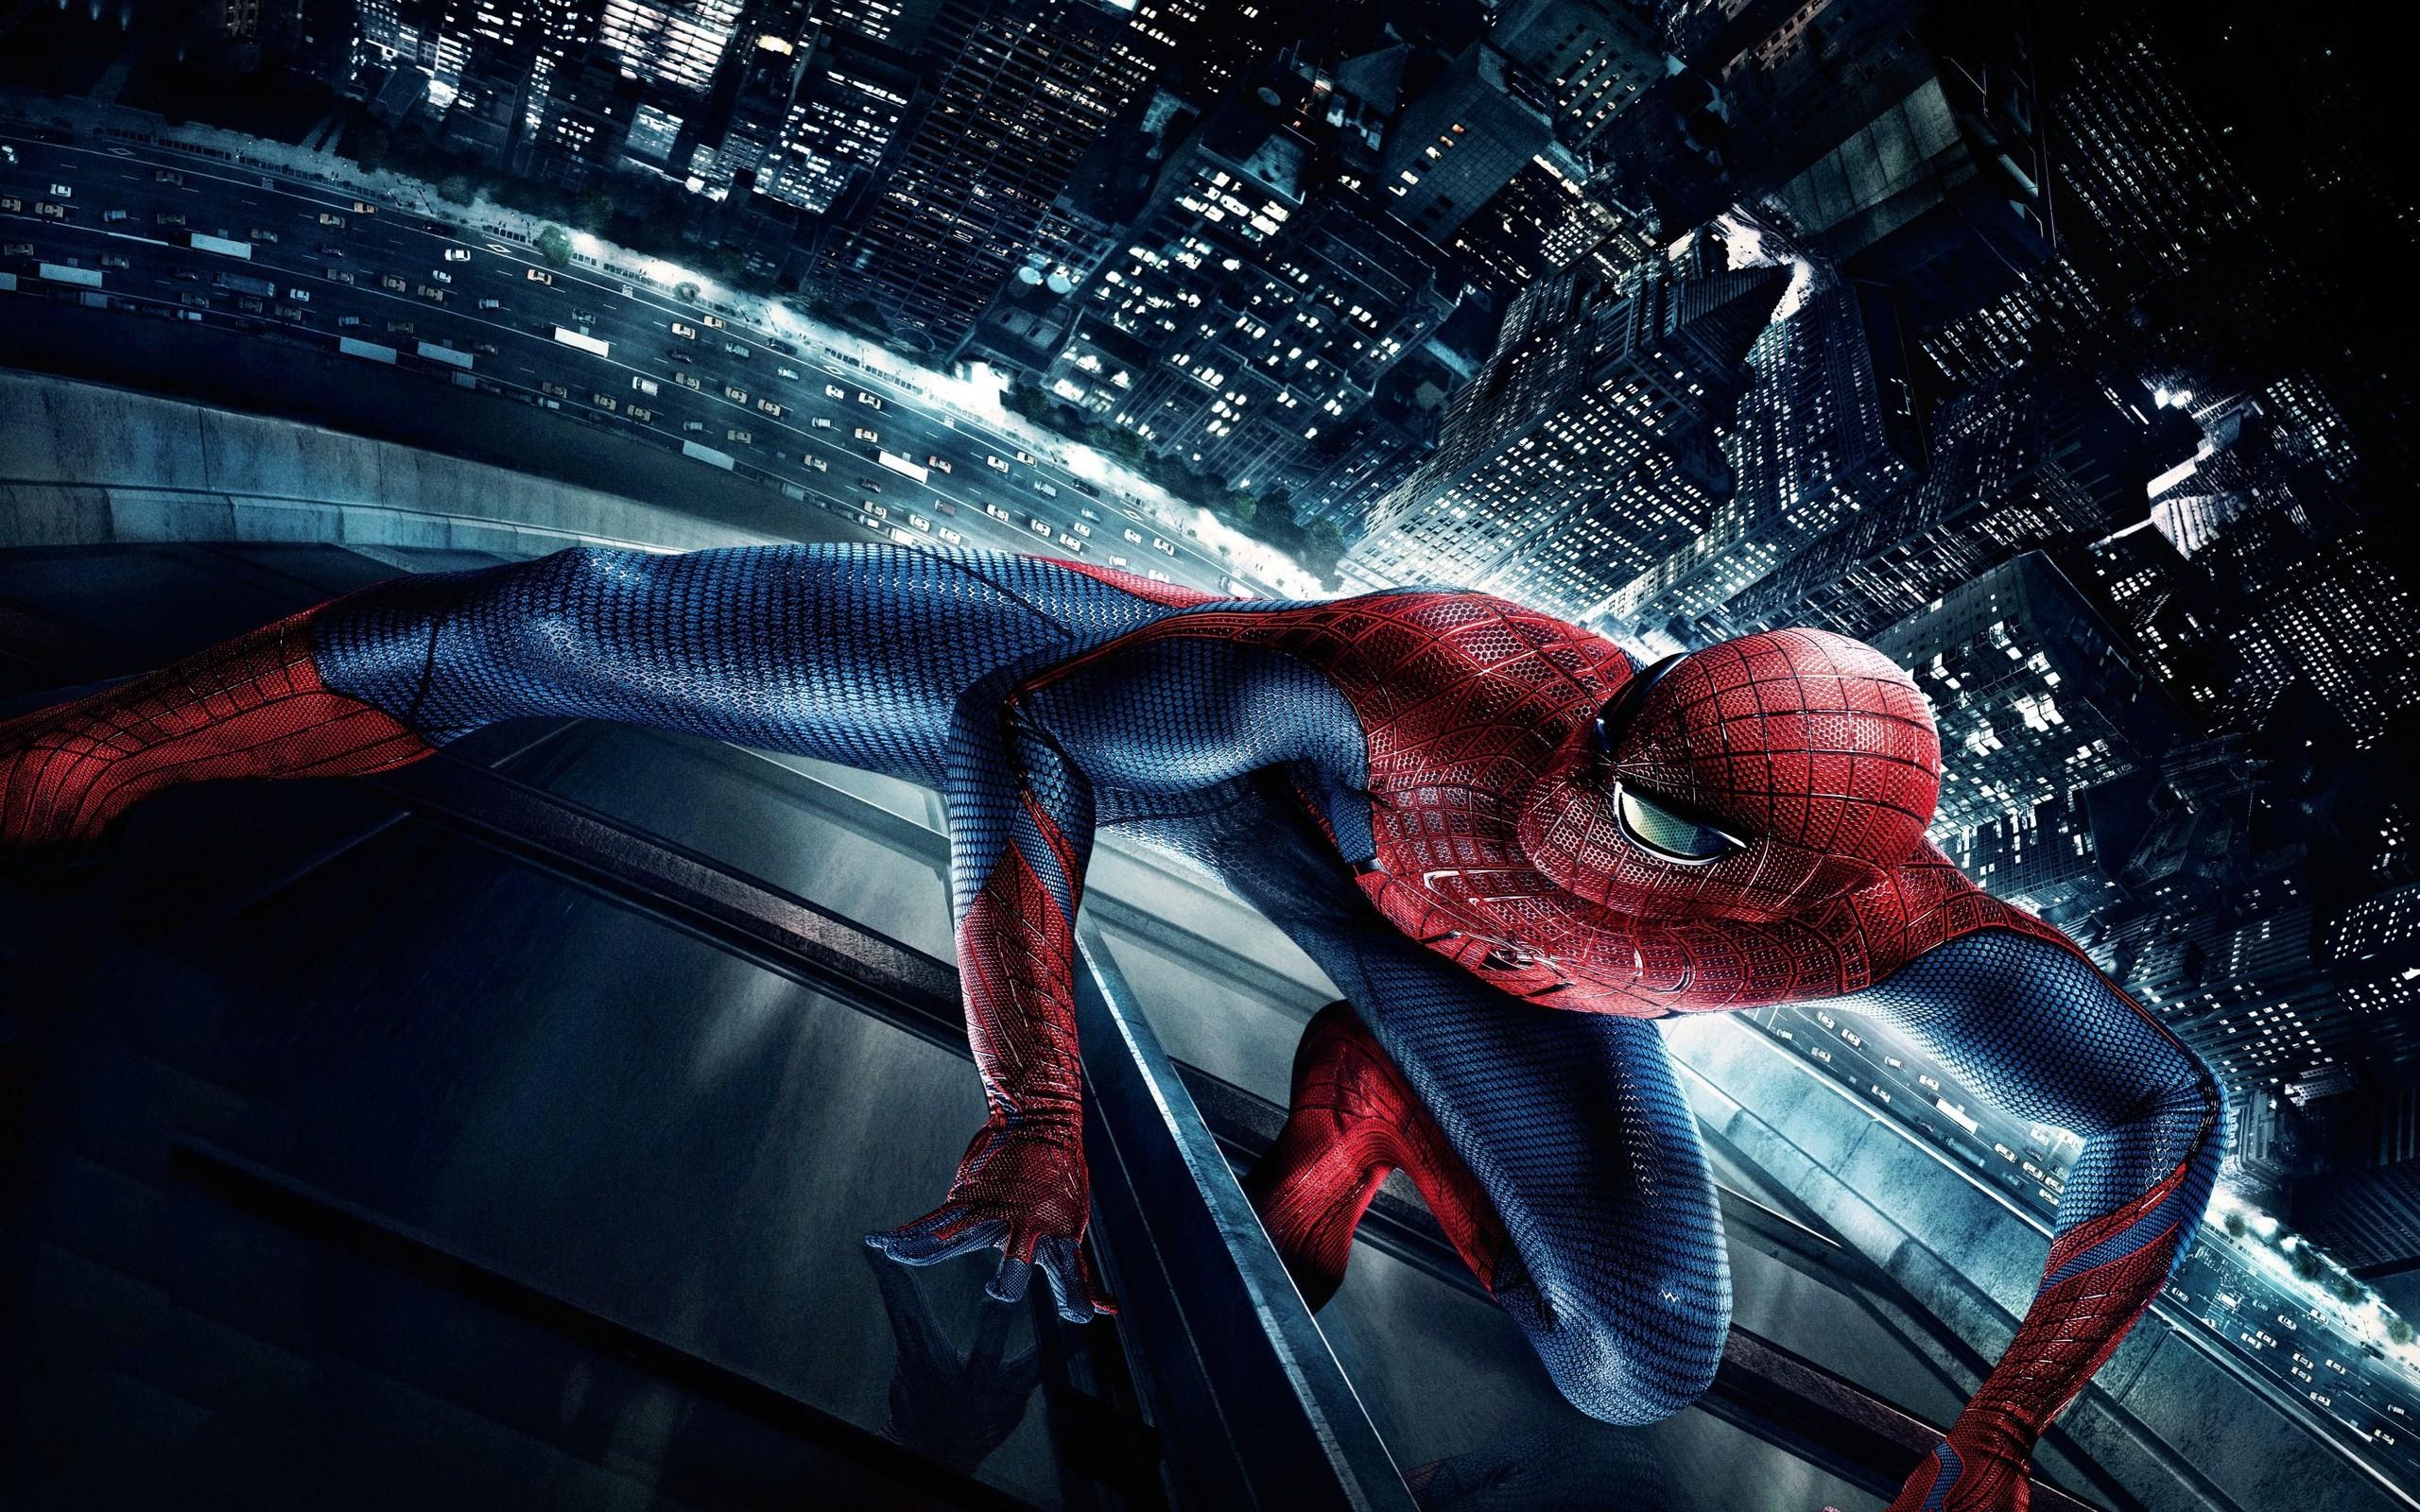 spiderman-hd-wallpapers-desktop